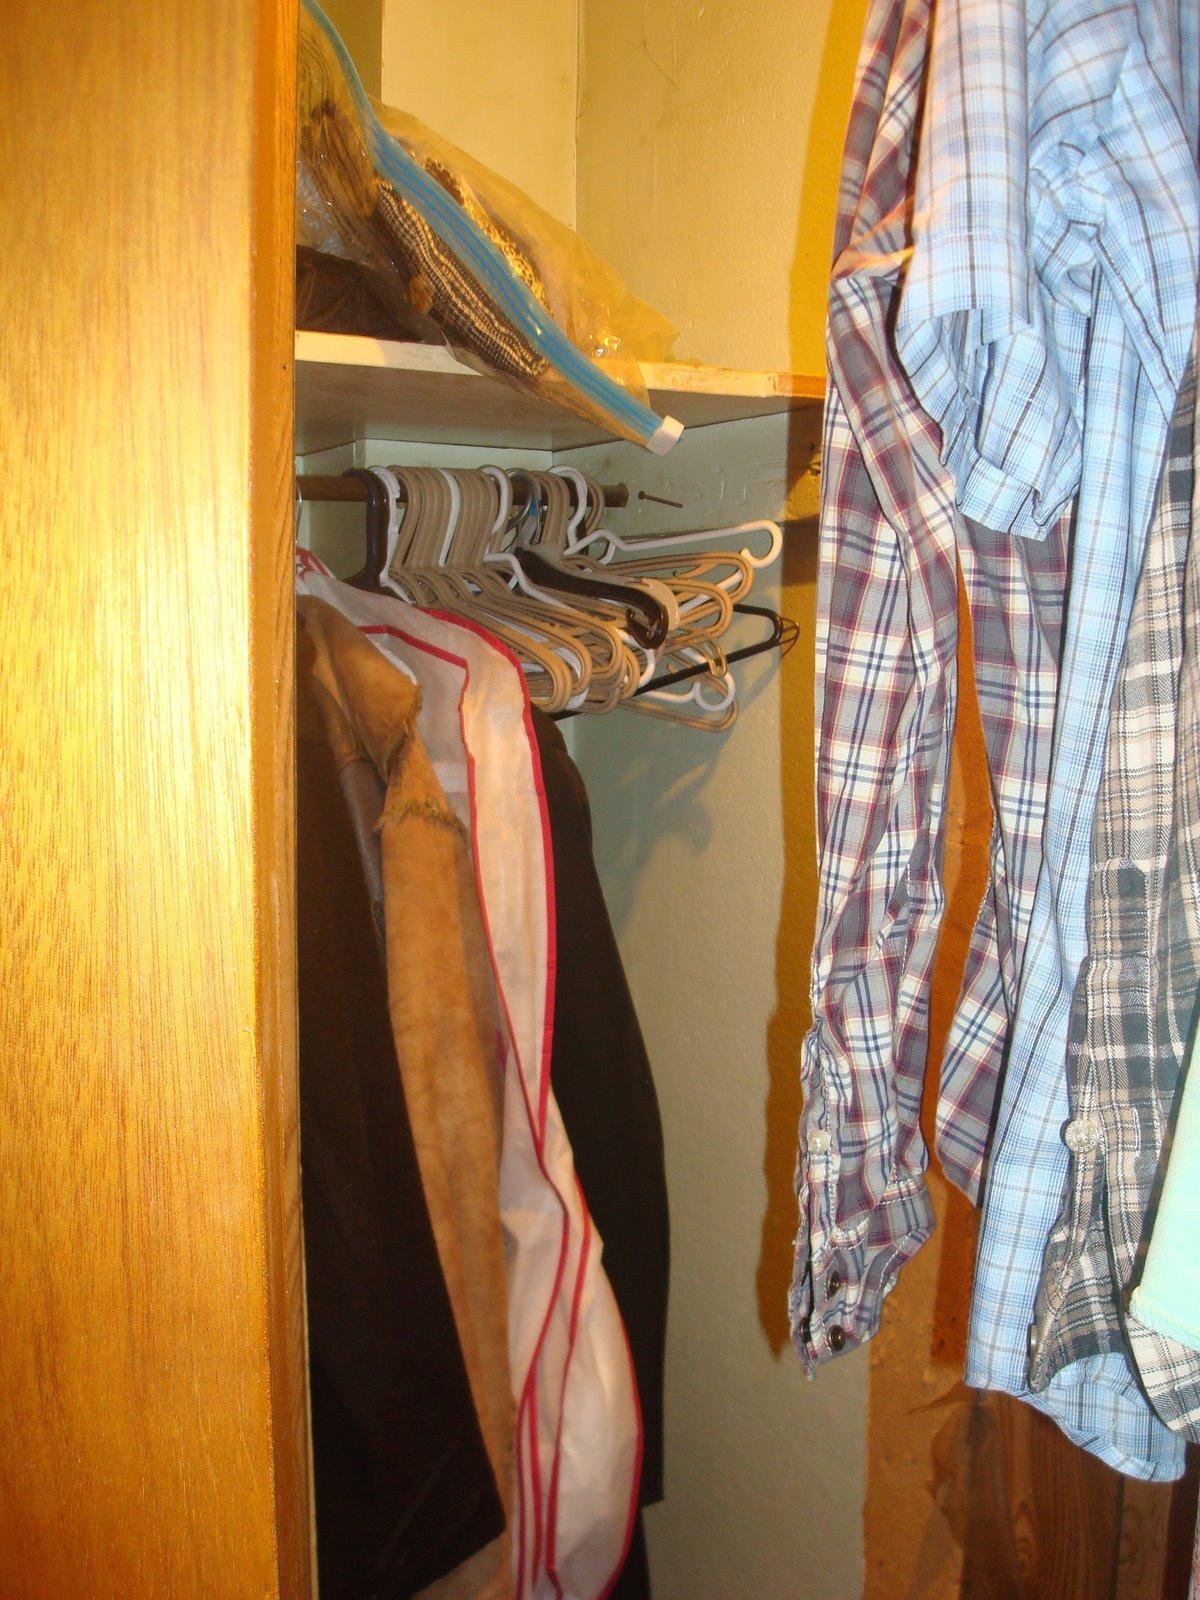 The Sewing Time Machine Broken Closet Broken Wardrobe